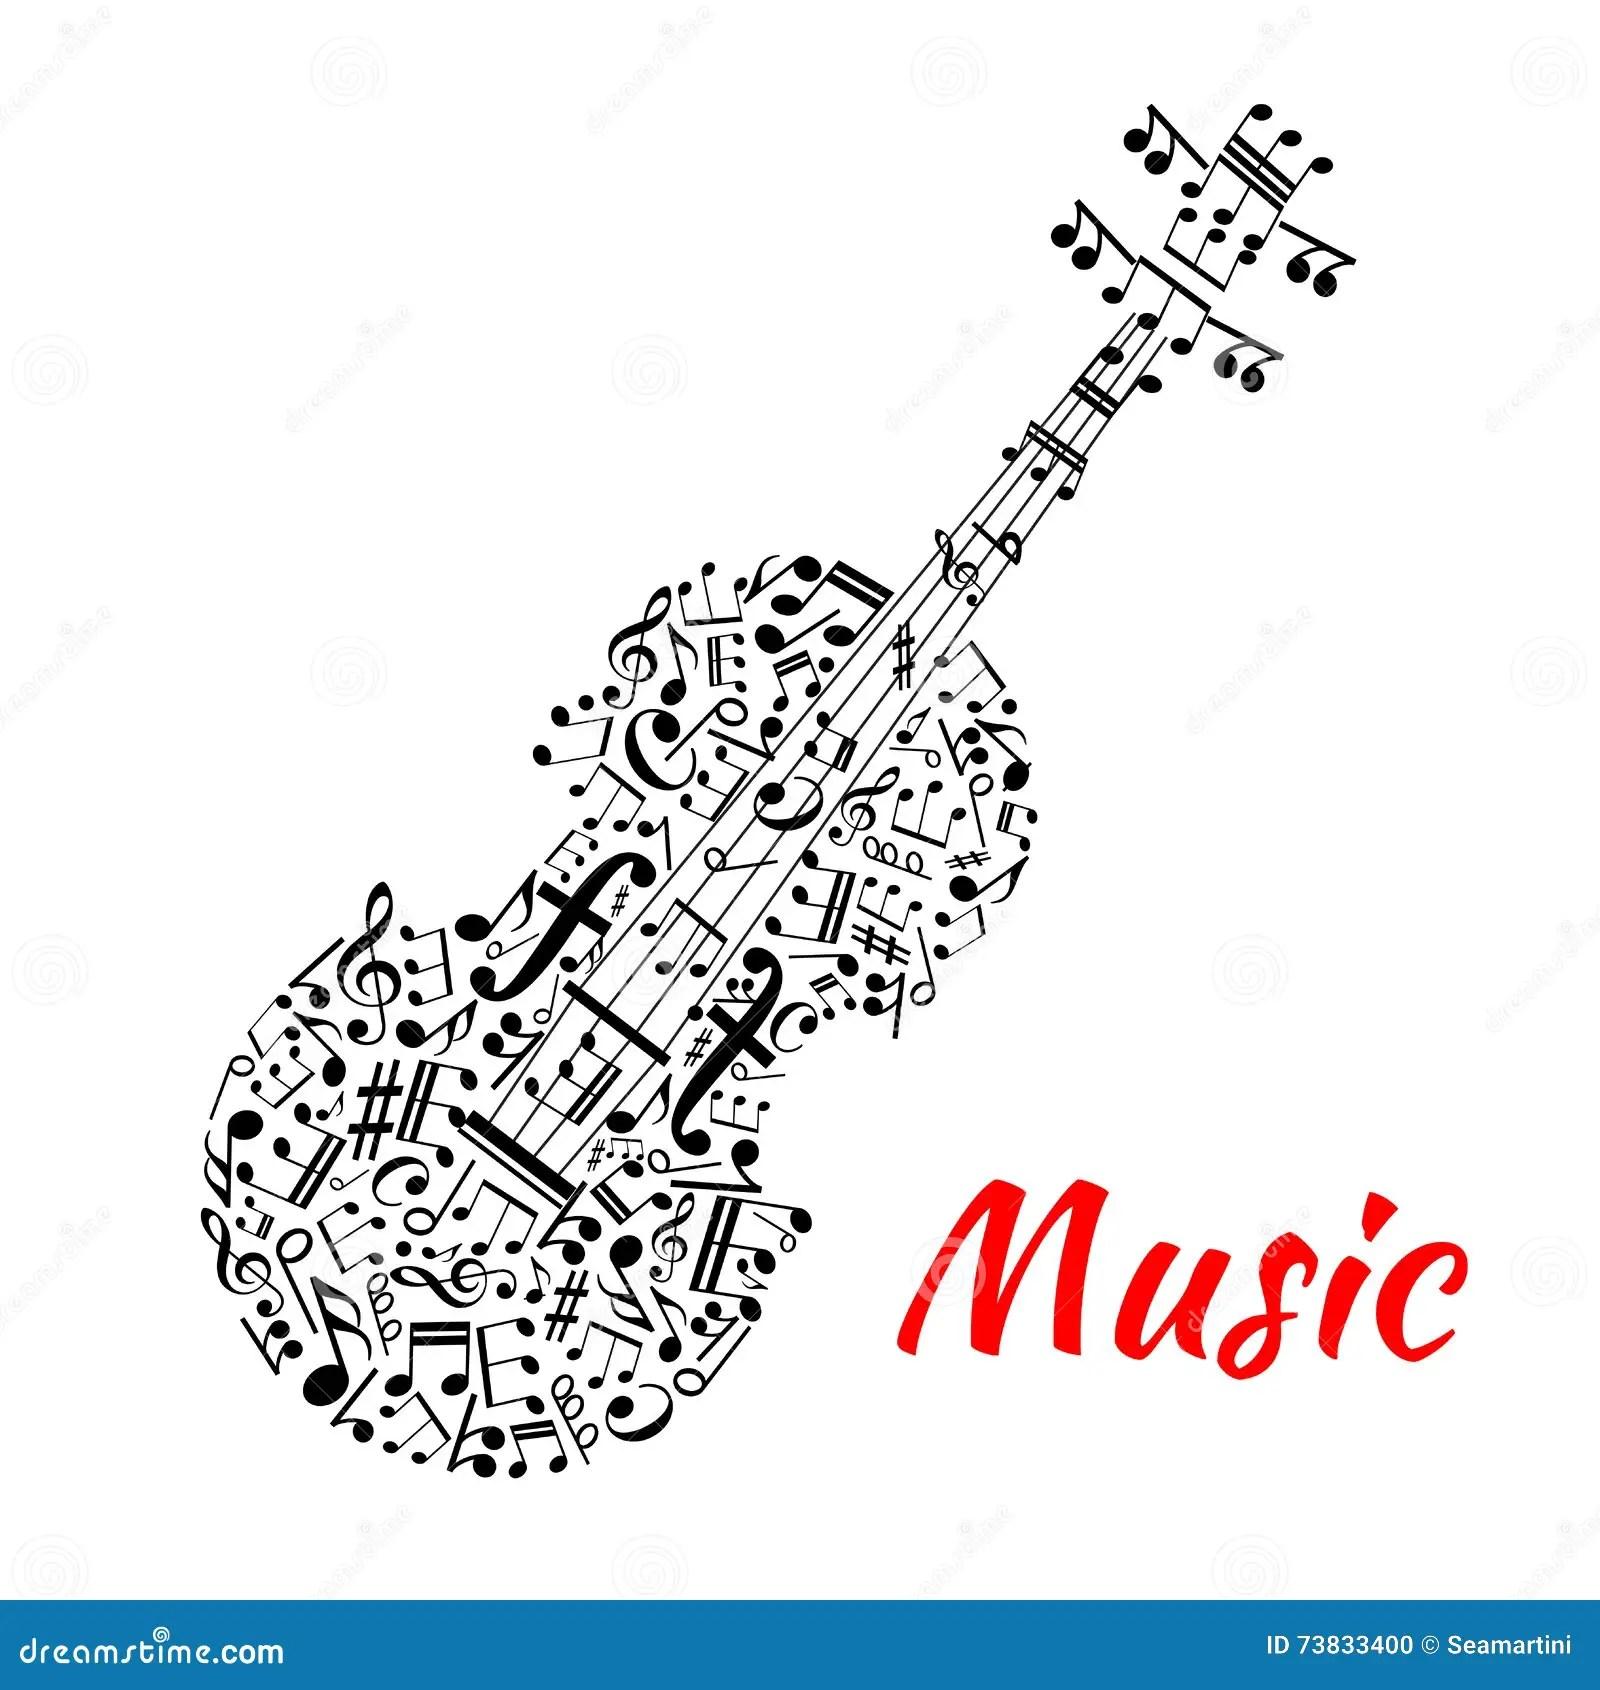 Musical Notes And Symbols Shaped Like A Violin Stock